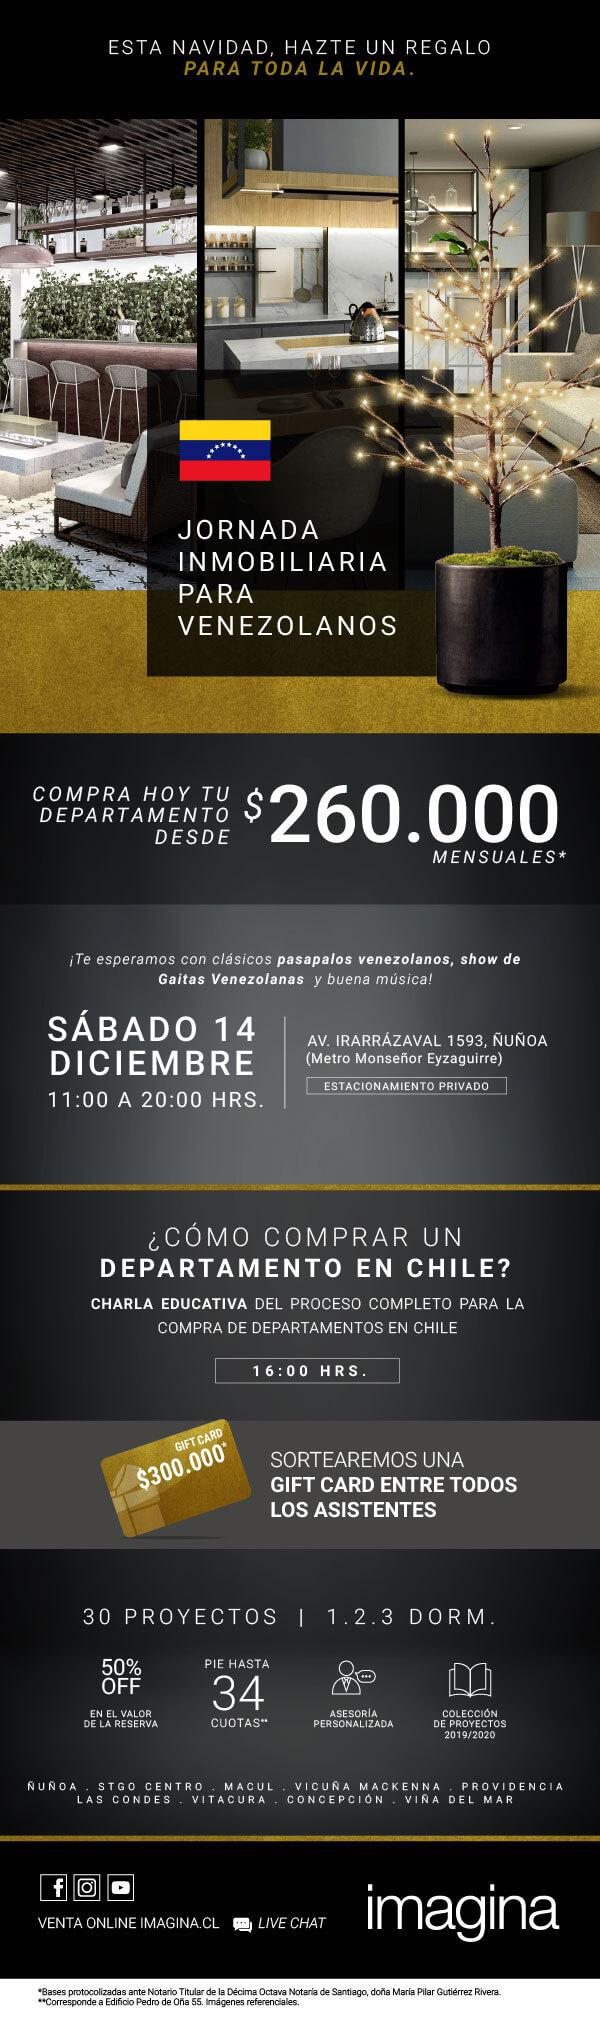 Evento-Imagina-Venezolanos-14-12-2019